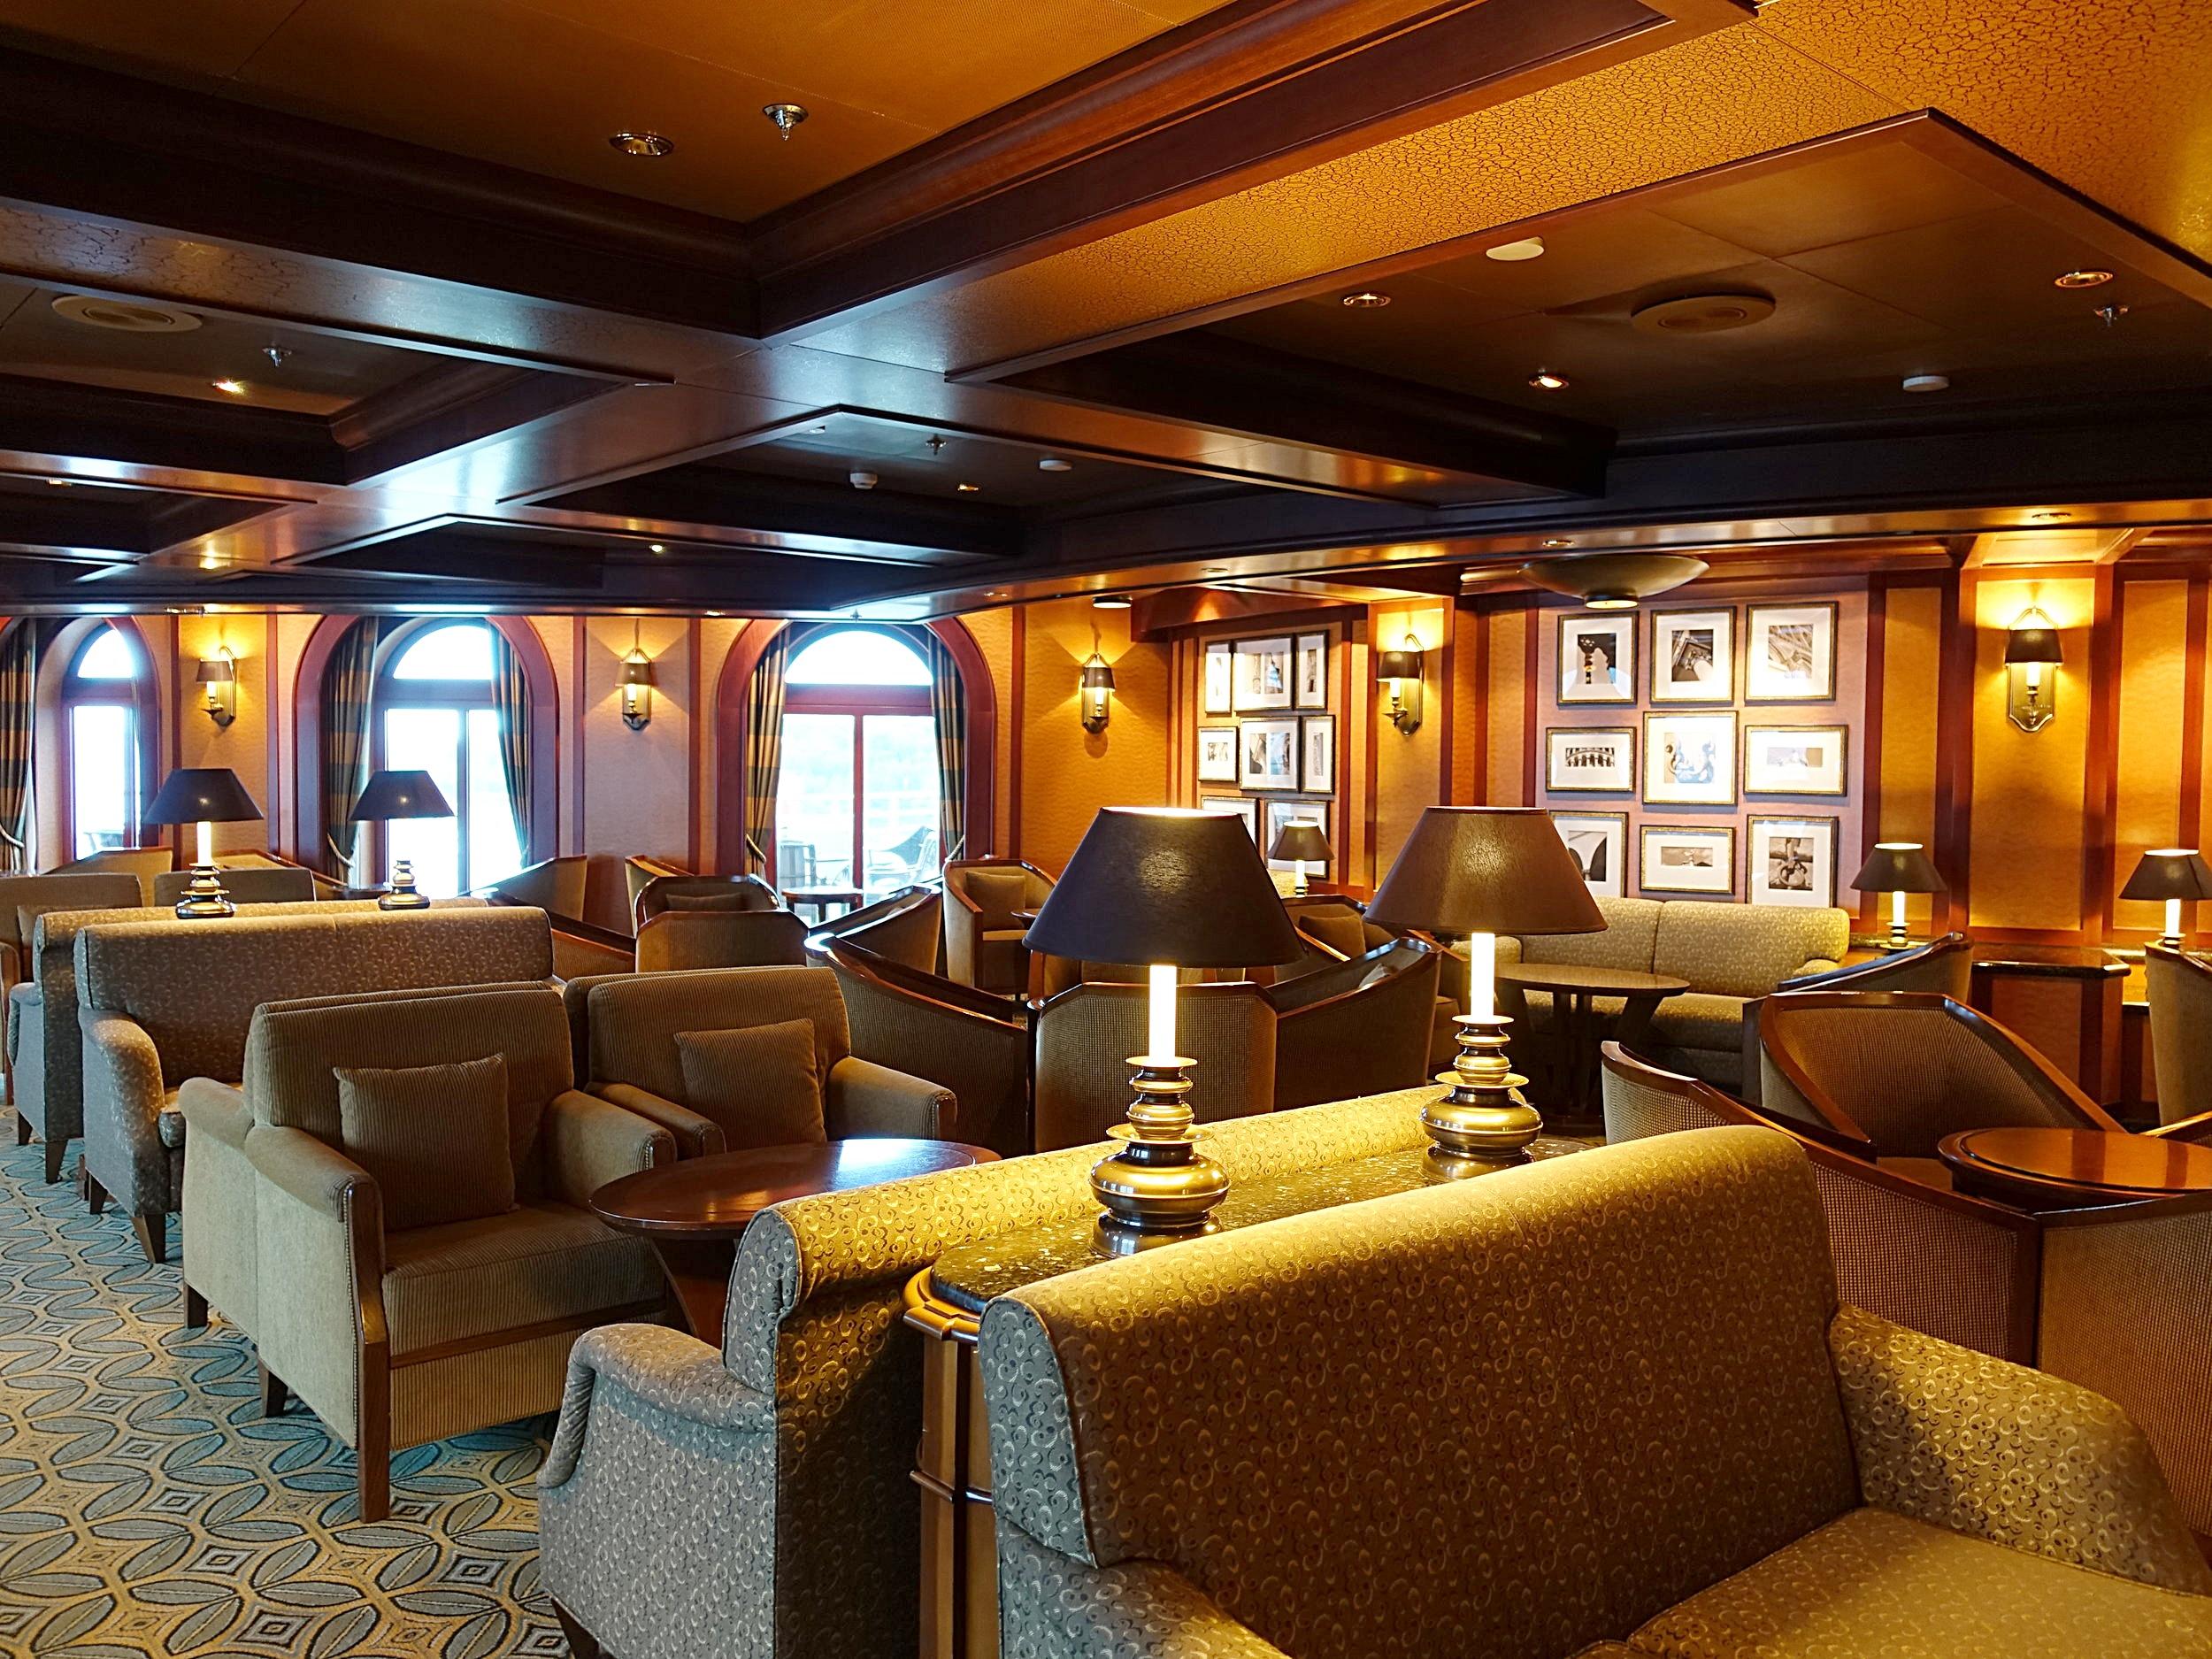 Adagios bar and lounge.